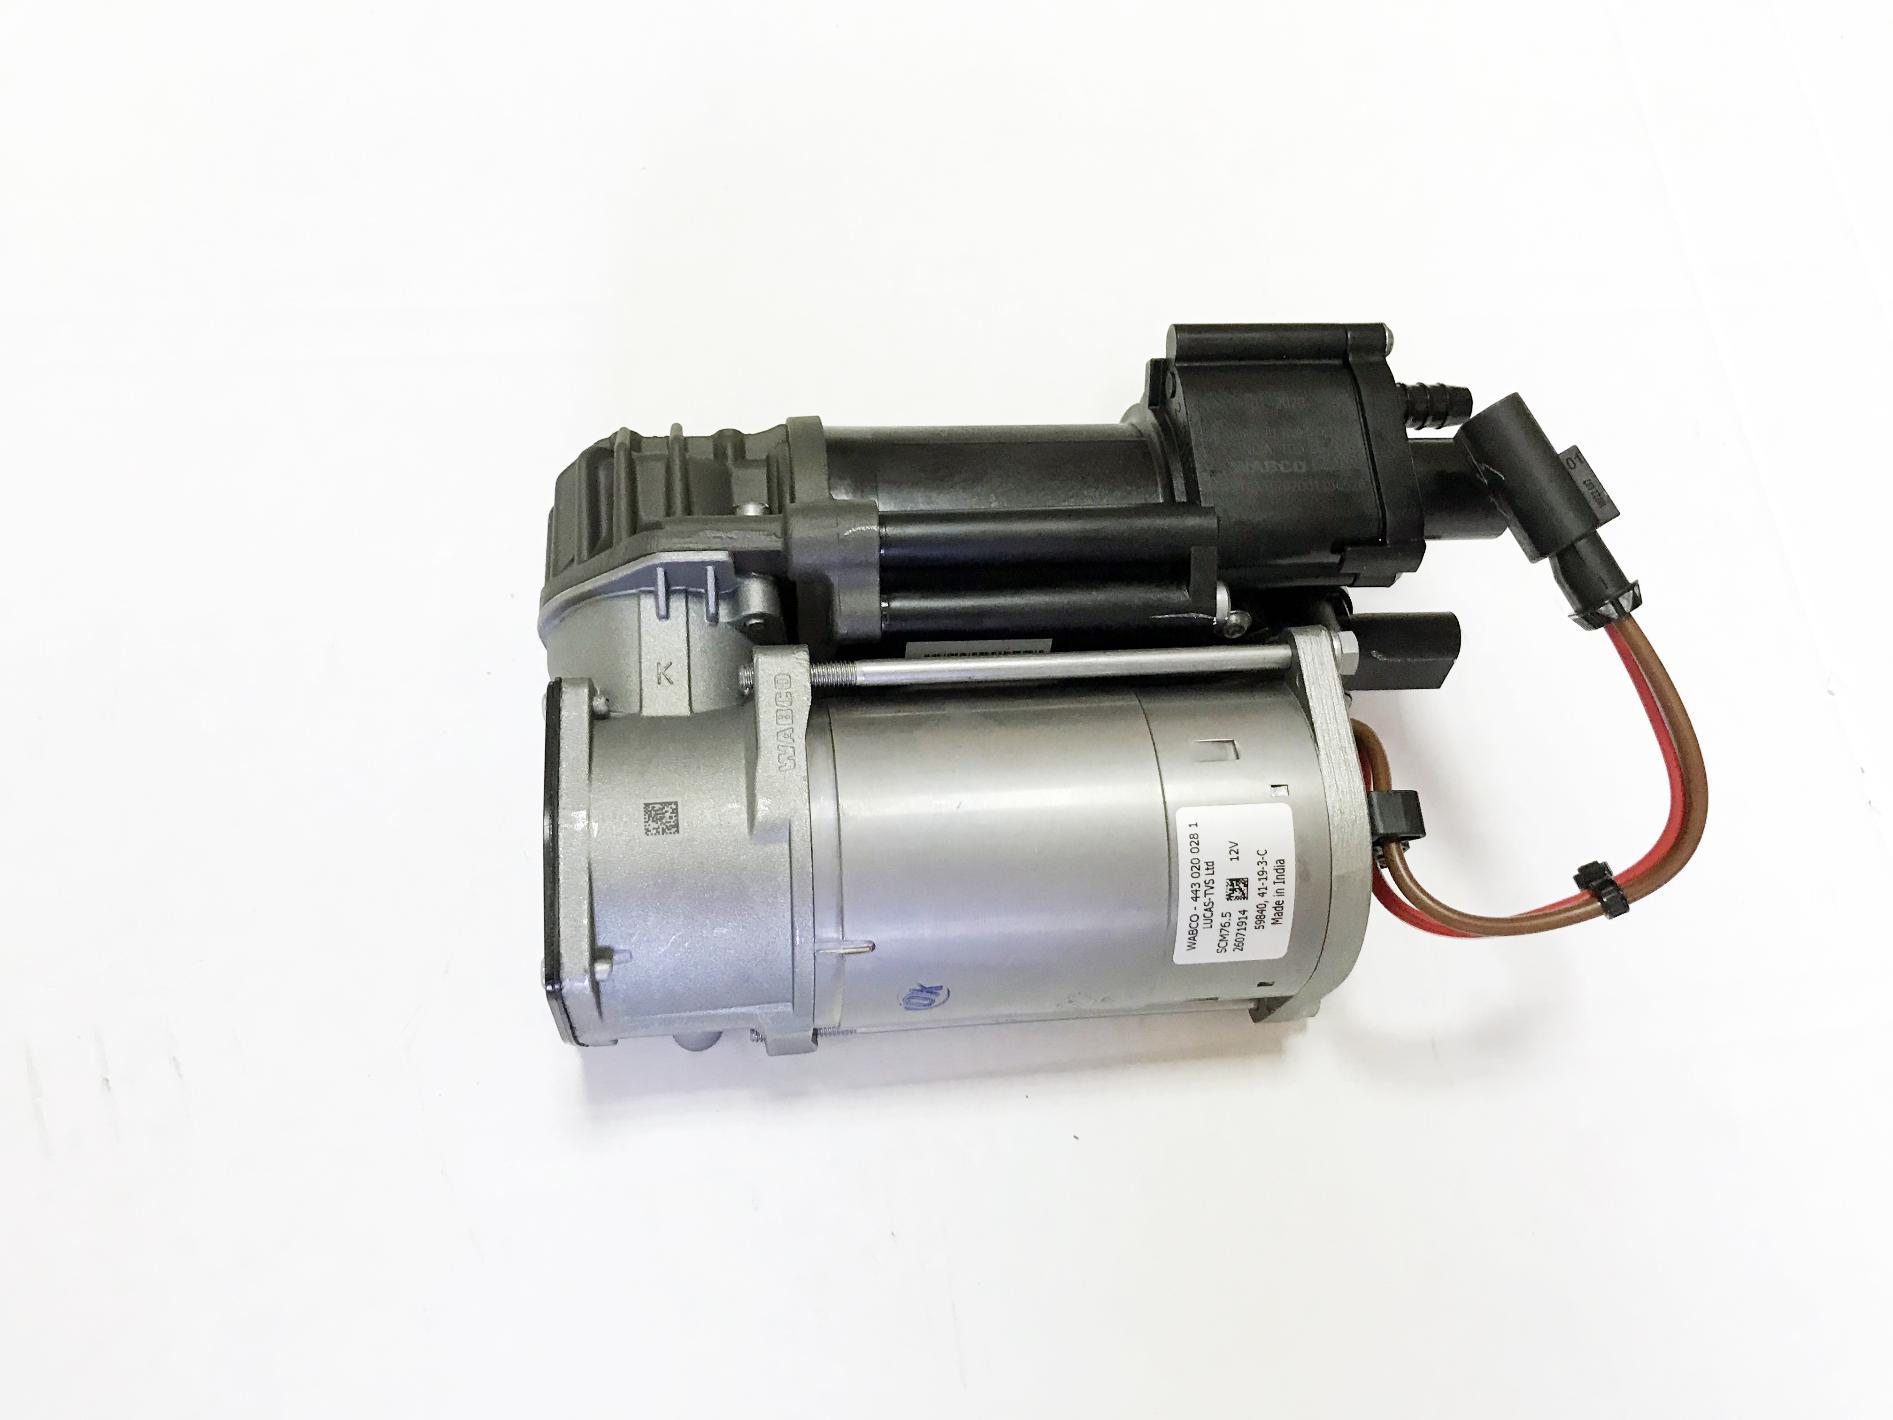 картинка Оригинальный компрессор пневмоподвески Wabco 37206875177 для BMW X5 (F15/ F85), X6 (F16/ F86) от магазина пневмоподвески ПневмоМаркет